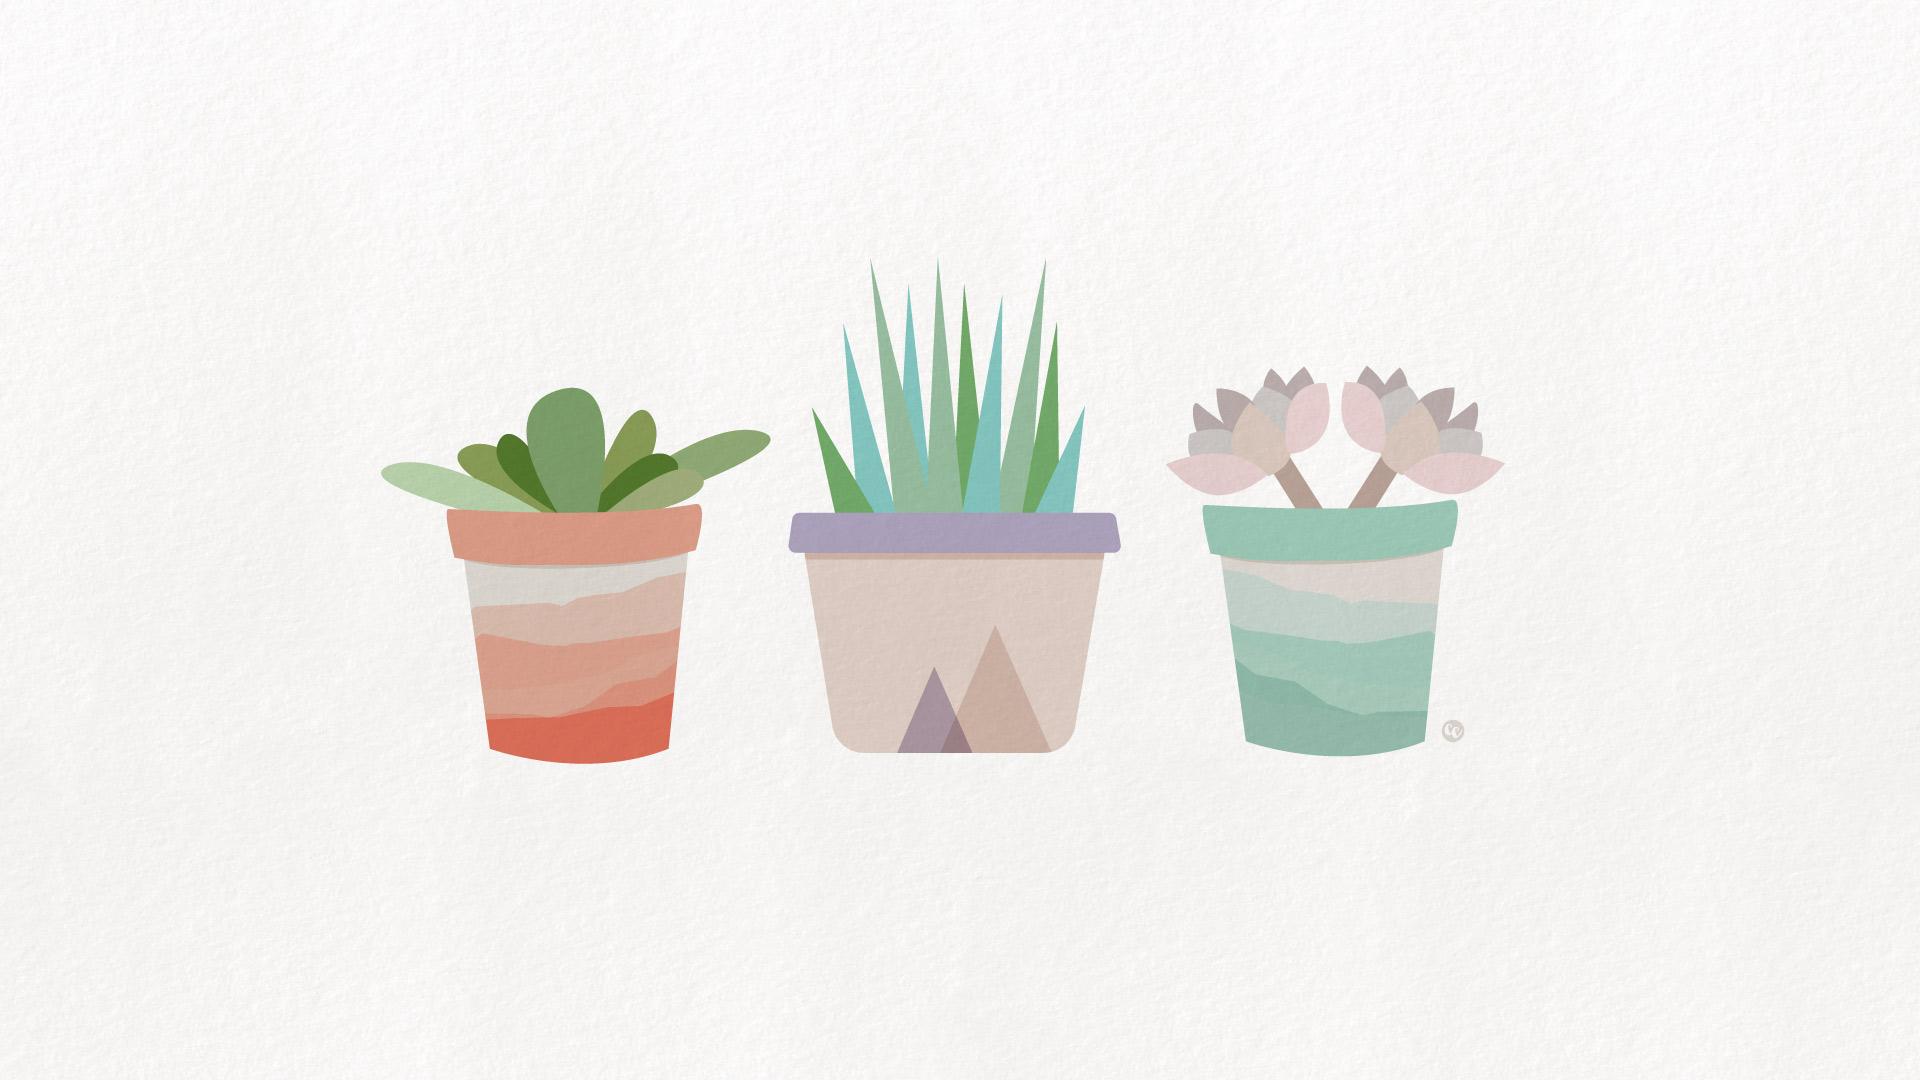 Cute Downloadable Wallpapers Free Desktop Wallpaper Succulents